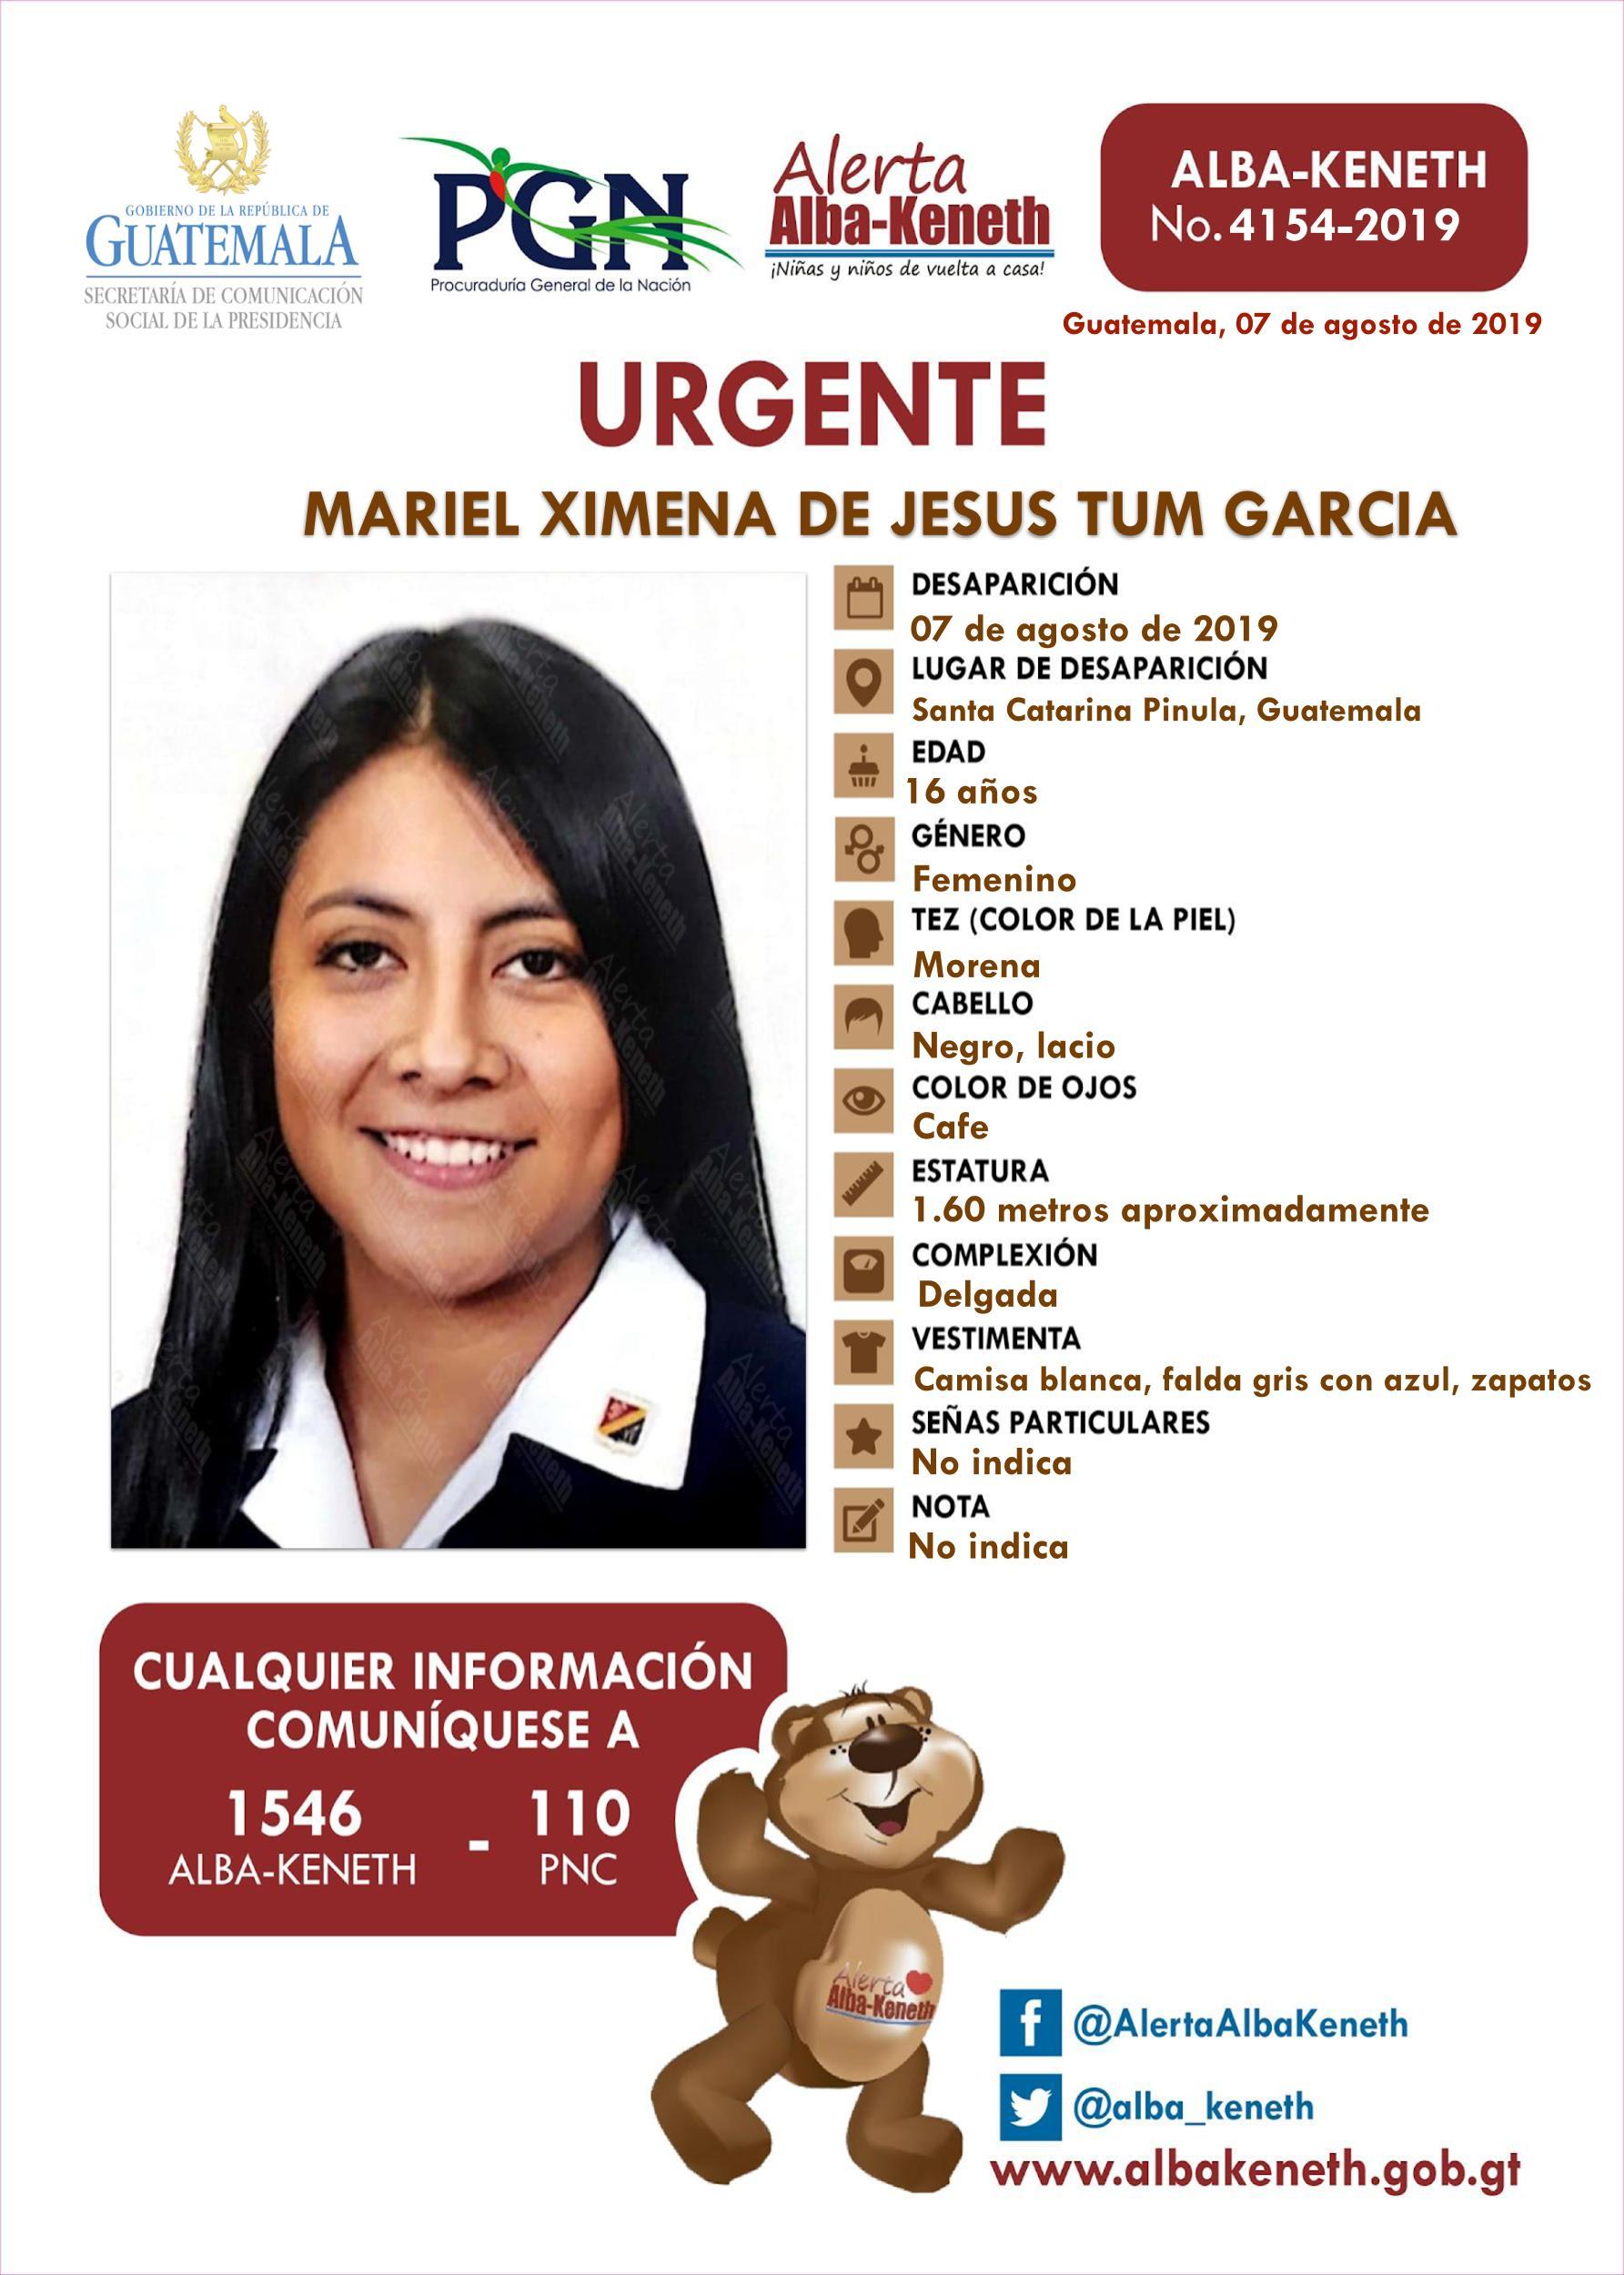 Mariel Ximena de Jesus Tum Garcia